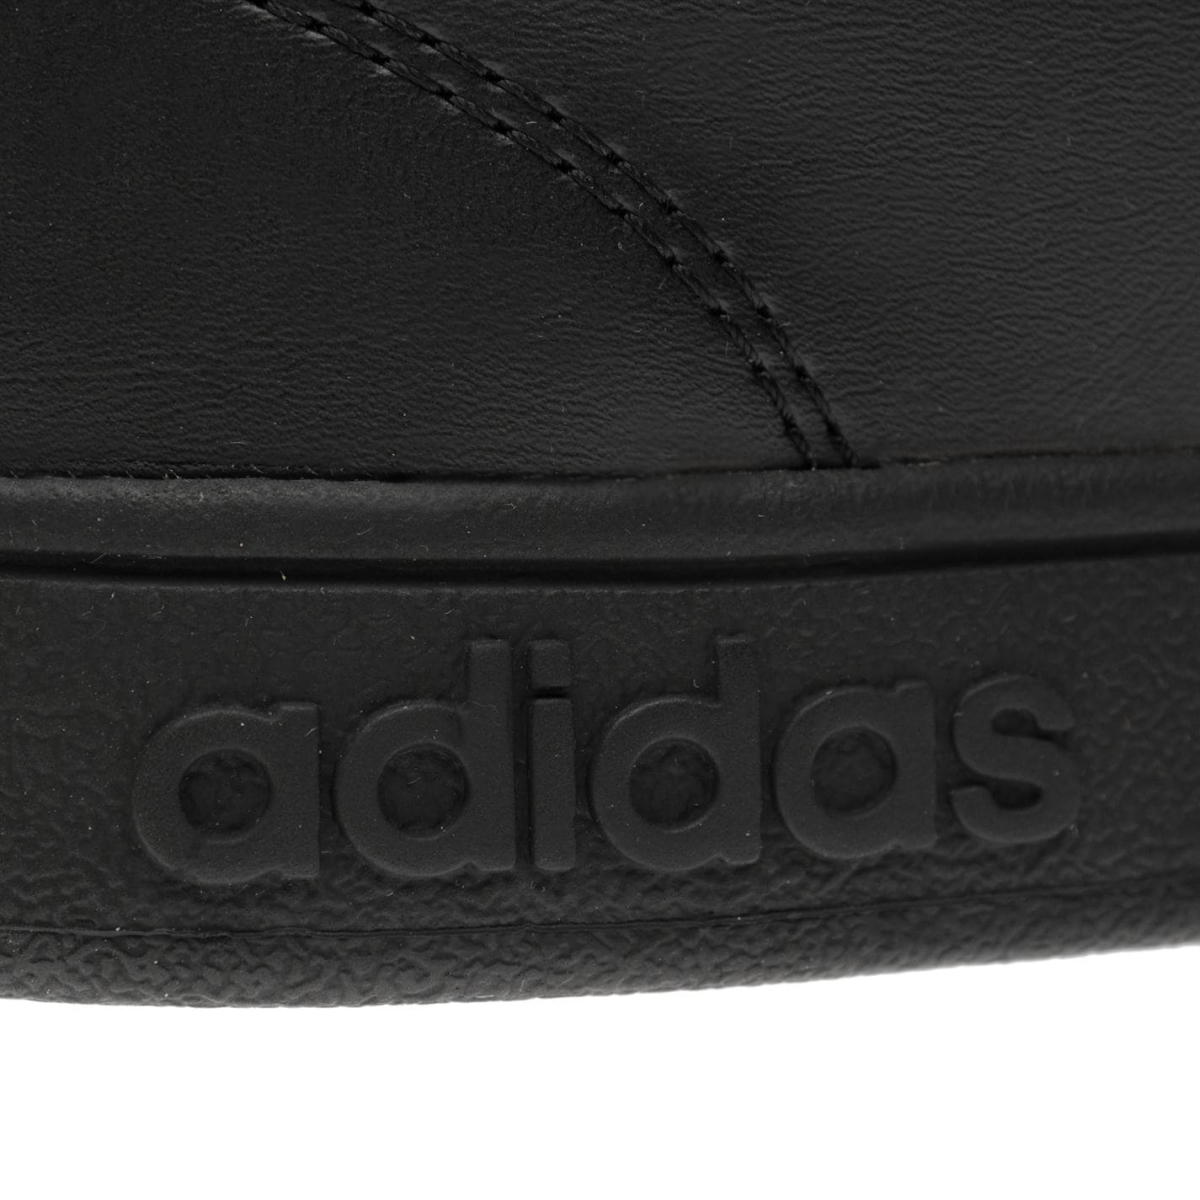 adidas-Advantage-Clean-Turnschuhe-Laufschuhe-Herren-Sneaker-Sportschuhe-3006 Indexbild 7